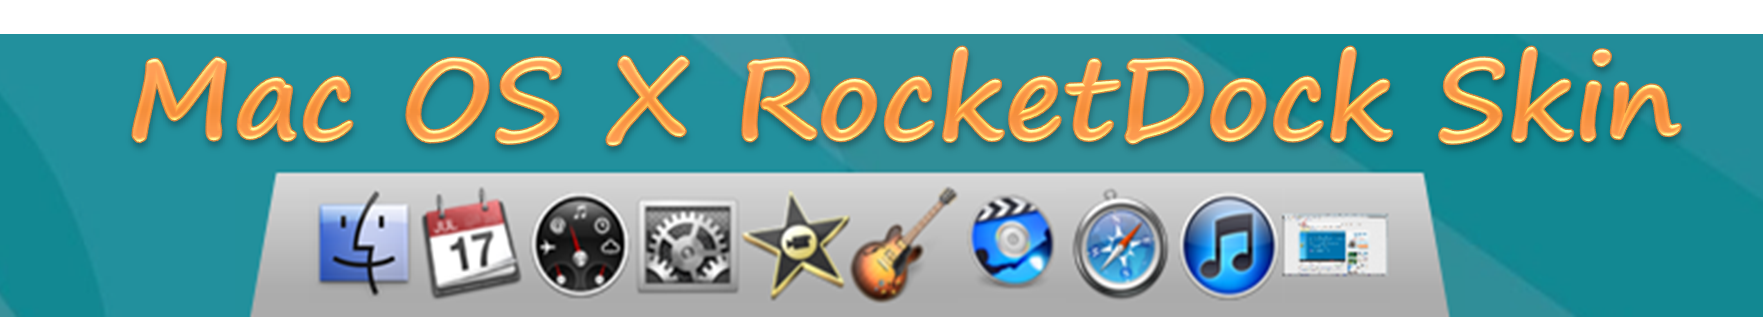 Mac os x skin for rocketdock - Mercedes gla bon coin immobilier